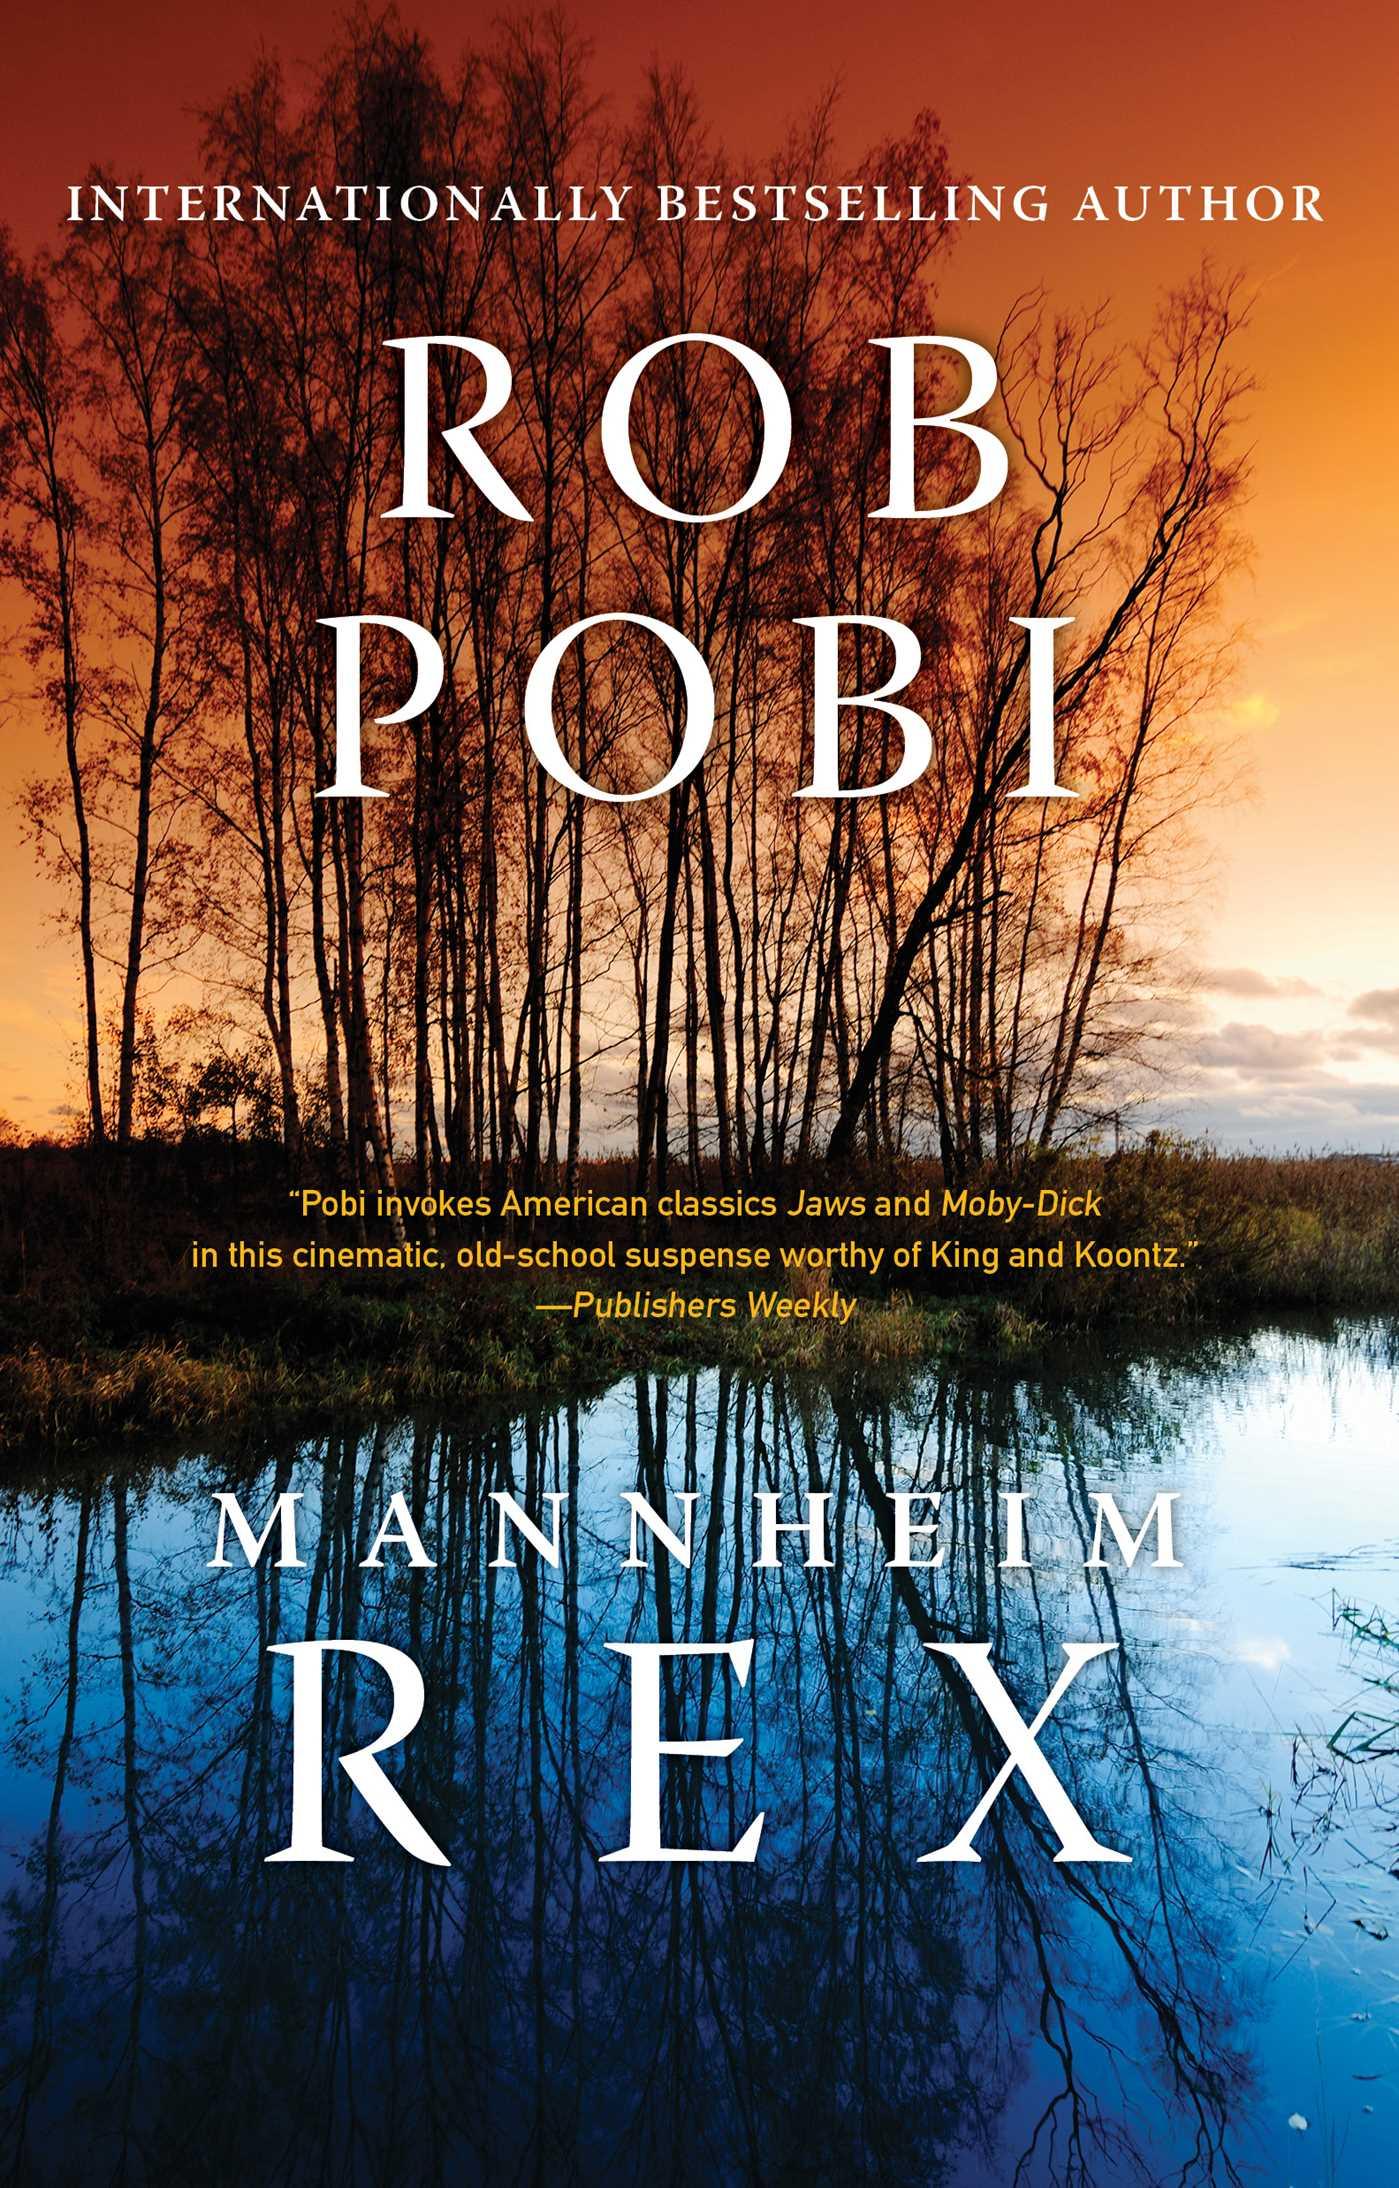 Mannheim rex 9781451654950 hr